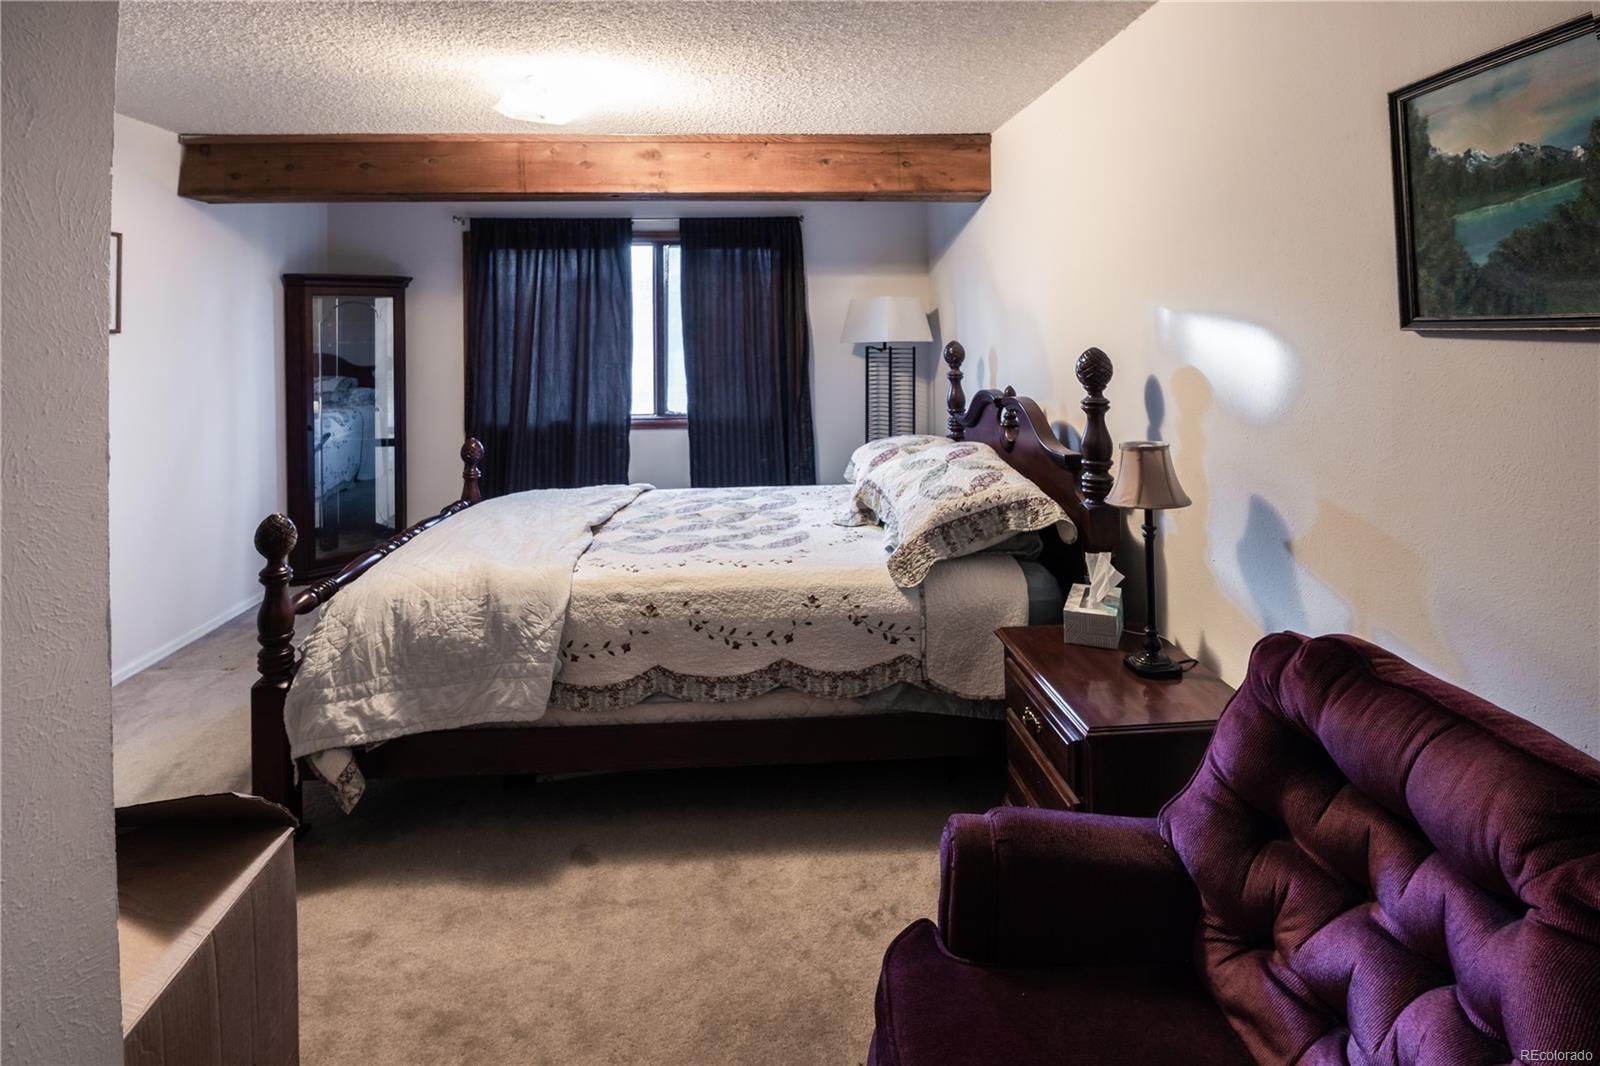 MLS# 4143722 - 1 - 10230  W Jewell Avenue, Lakewood, CO 80232